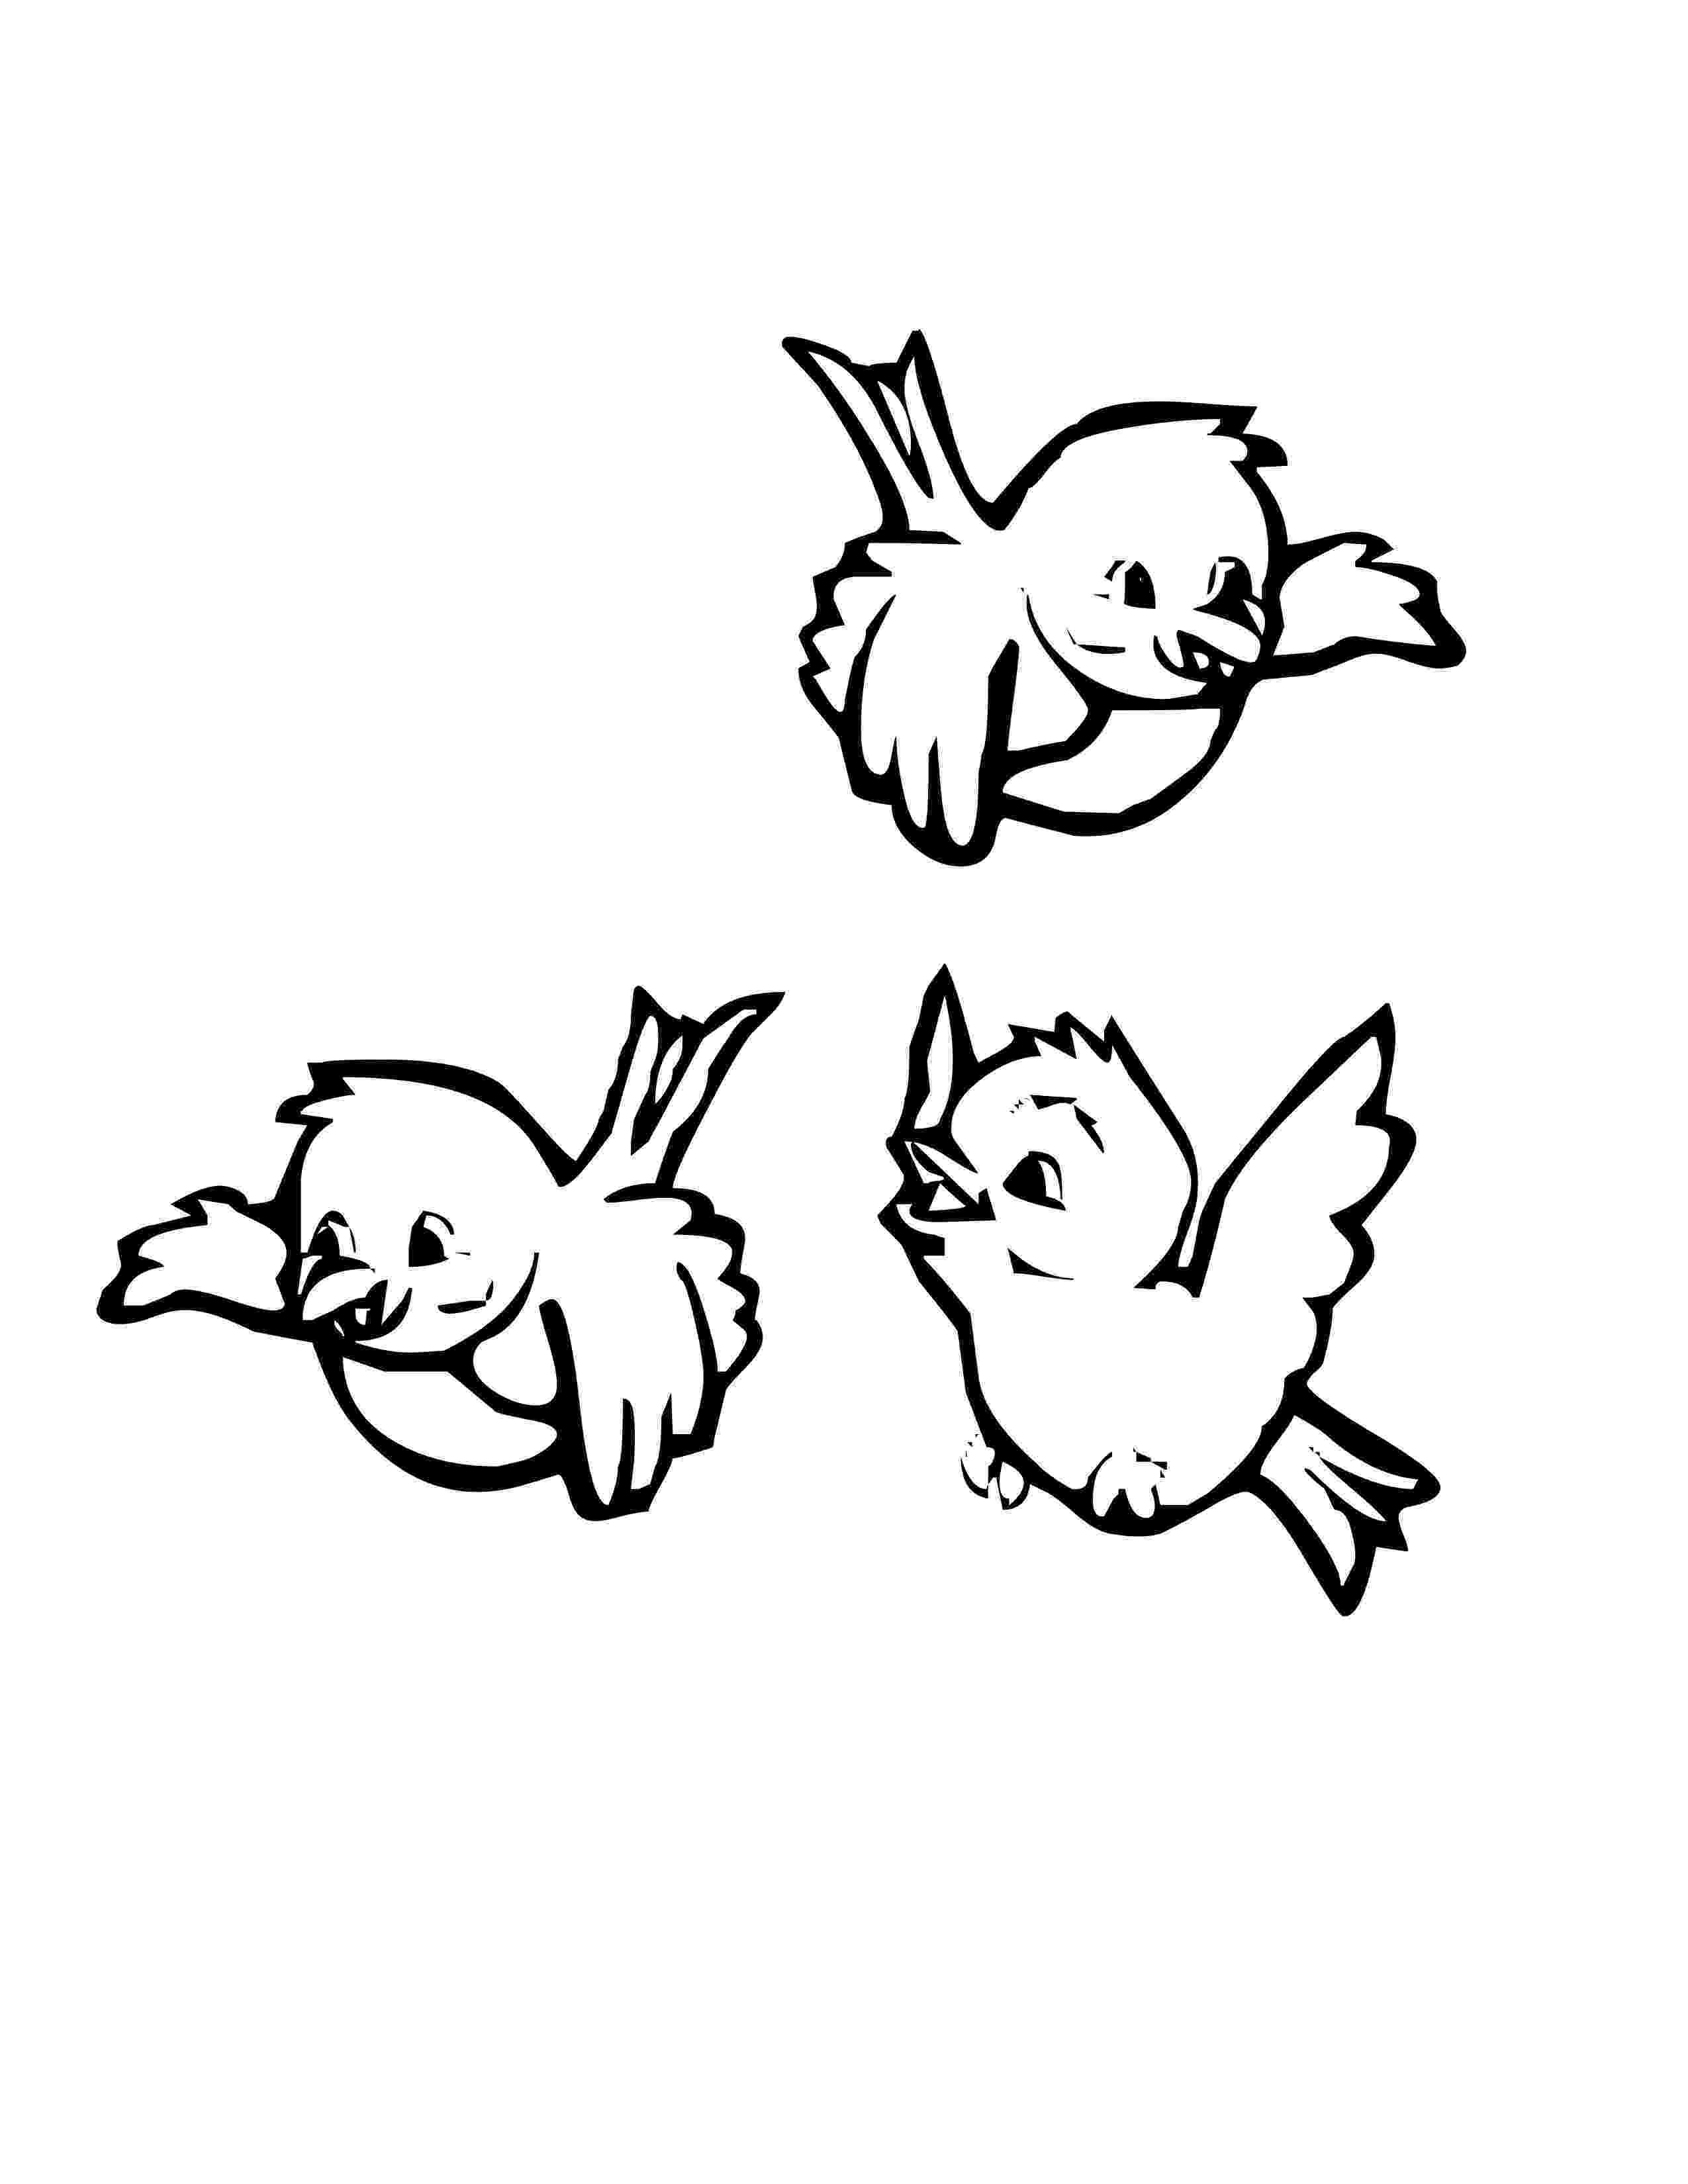 bird coloring pages free bird coloring pages free bird coloring pages